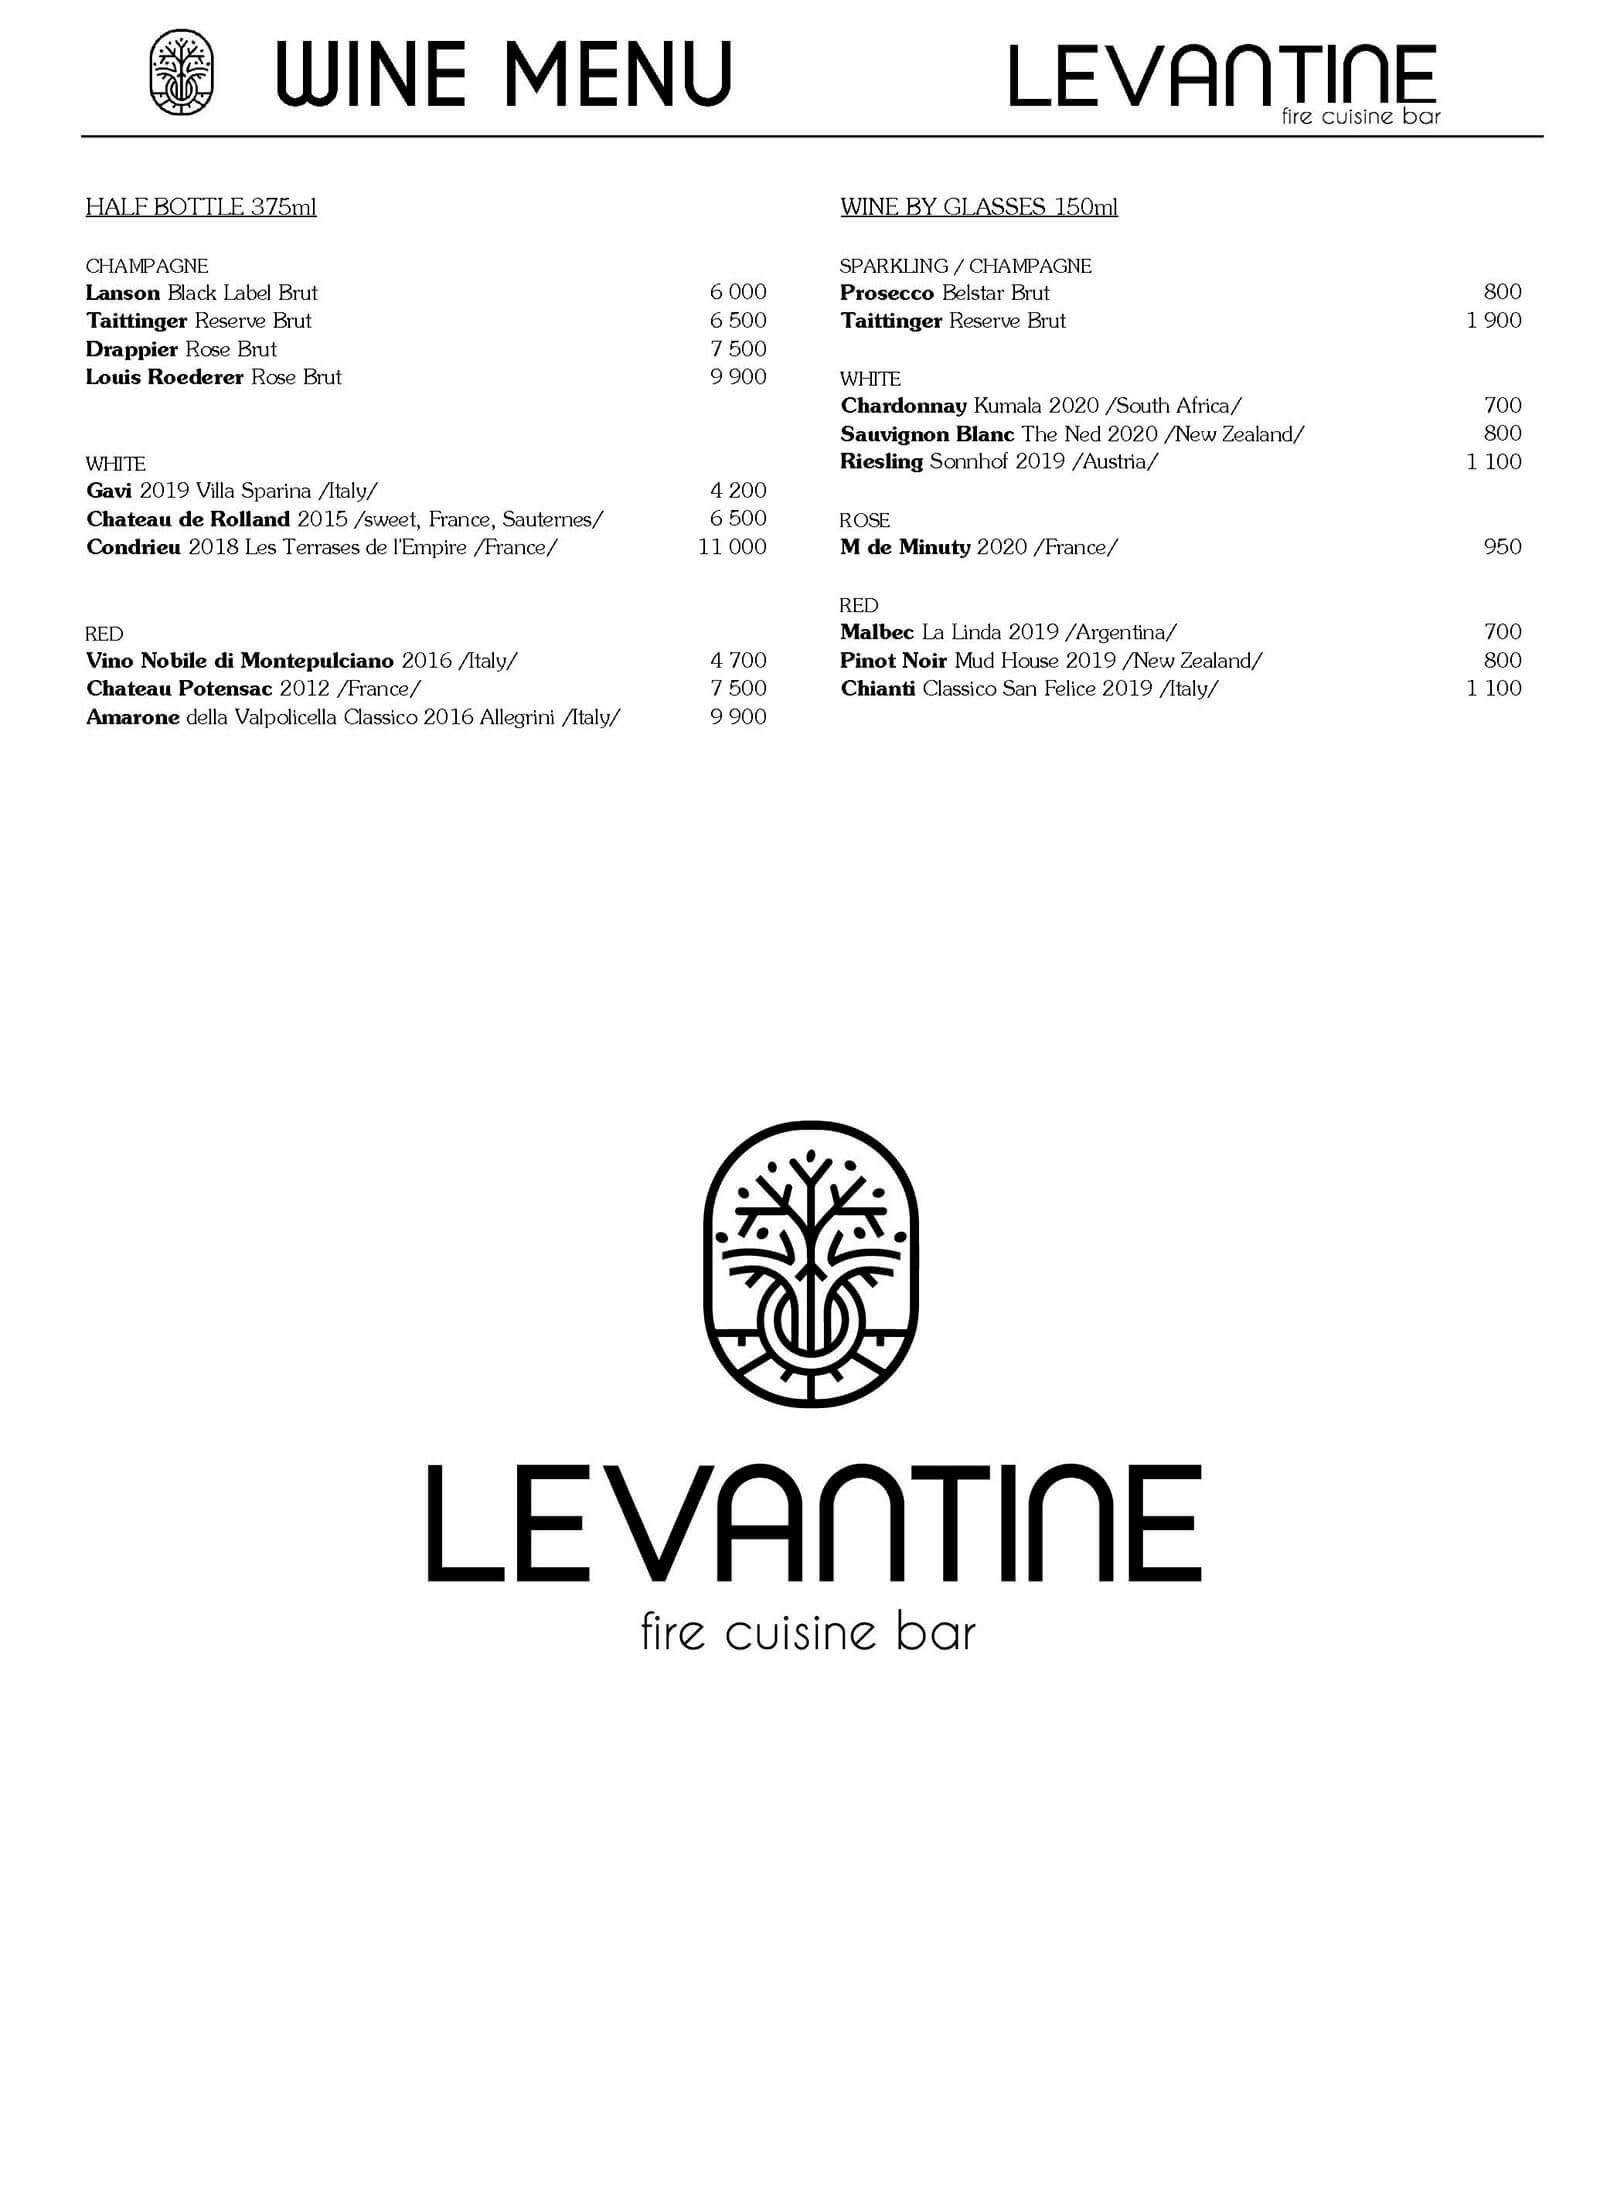 Levantine Wine Menu